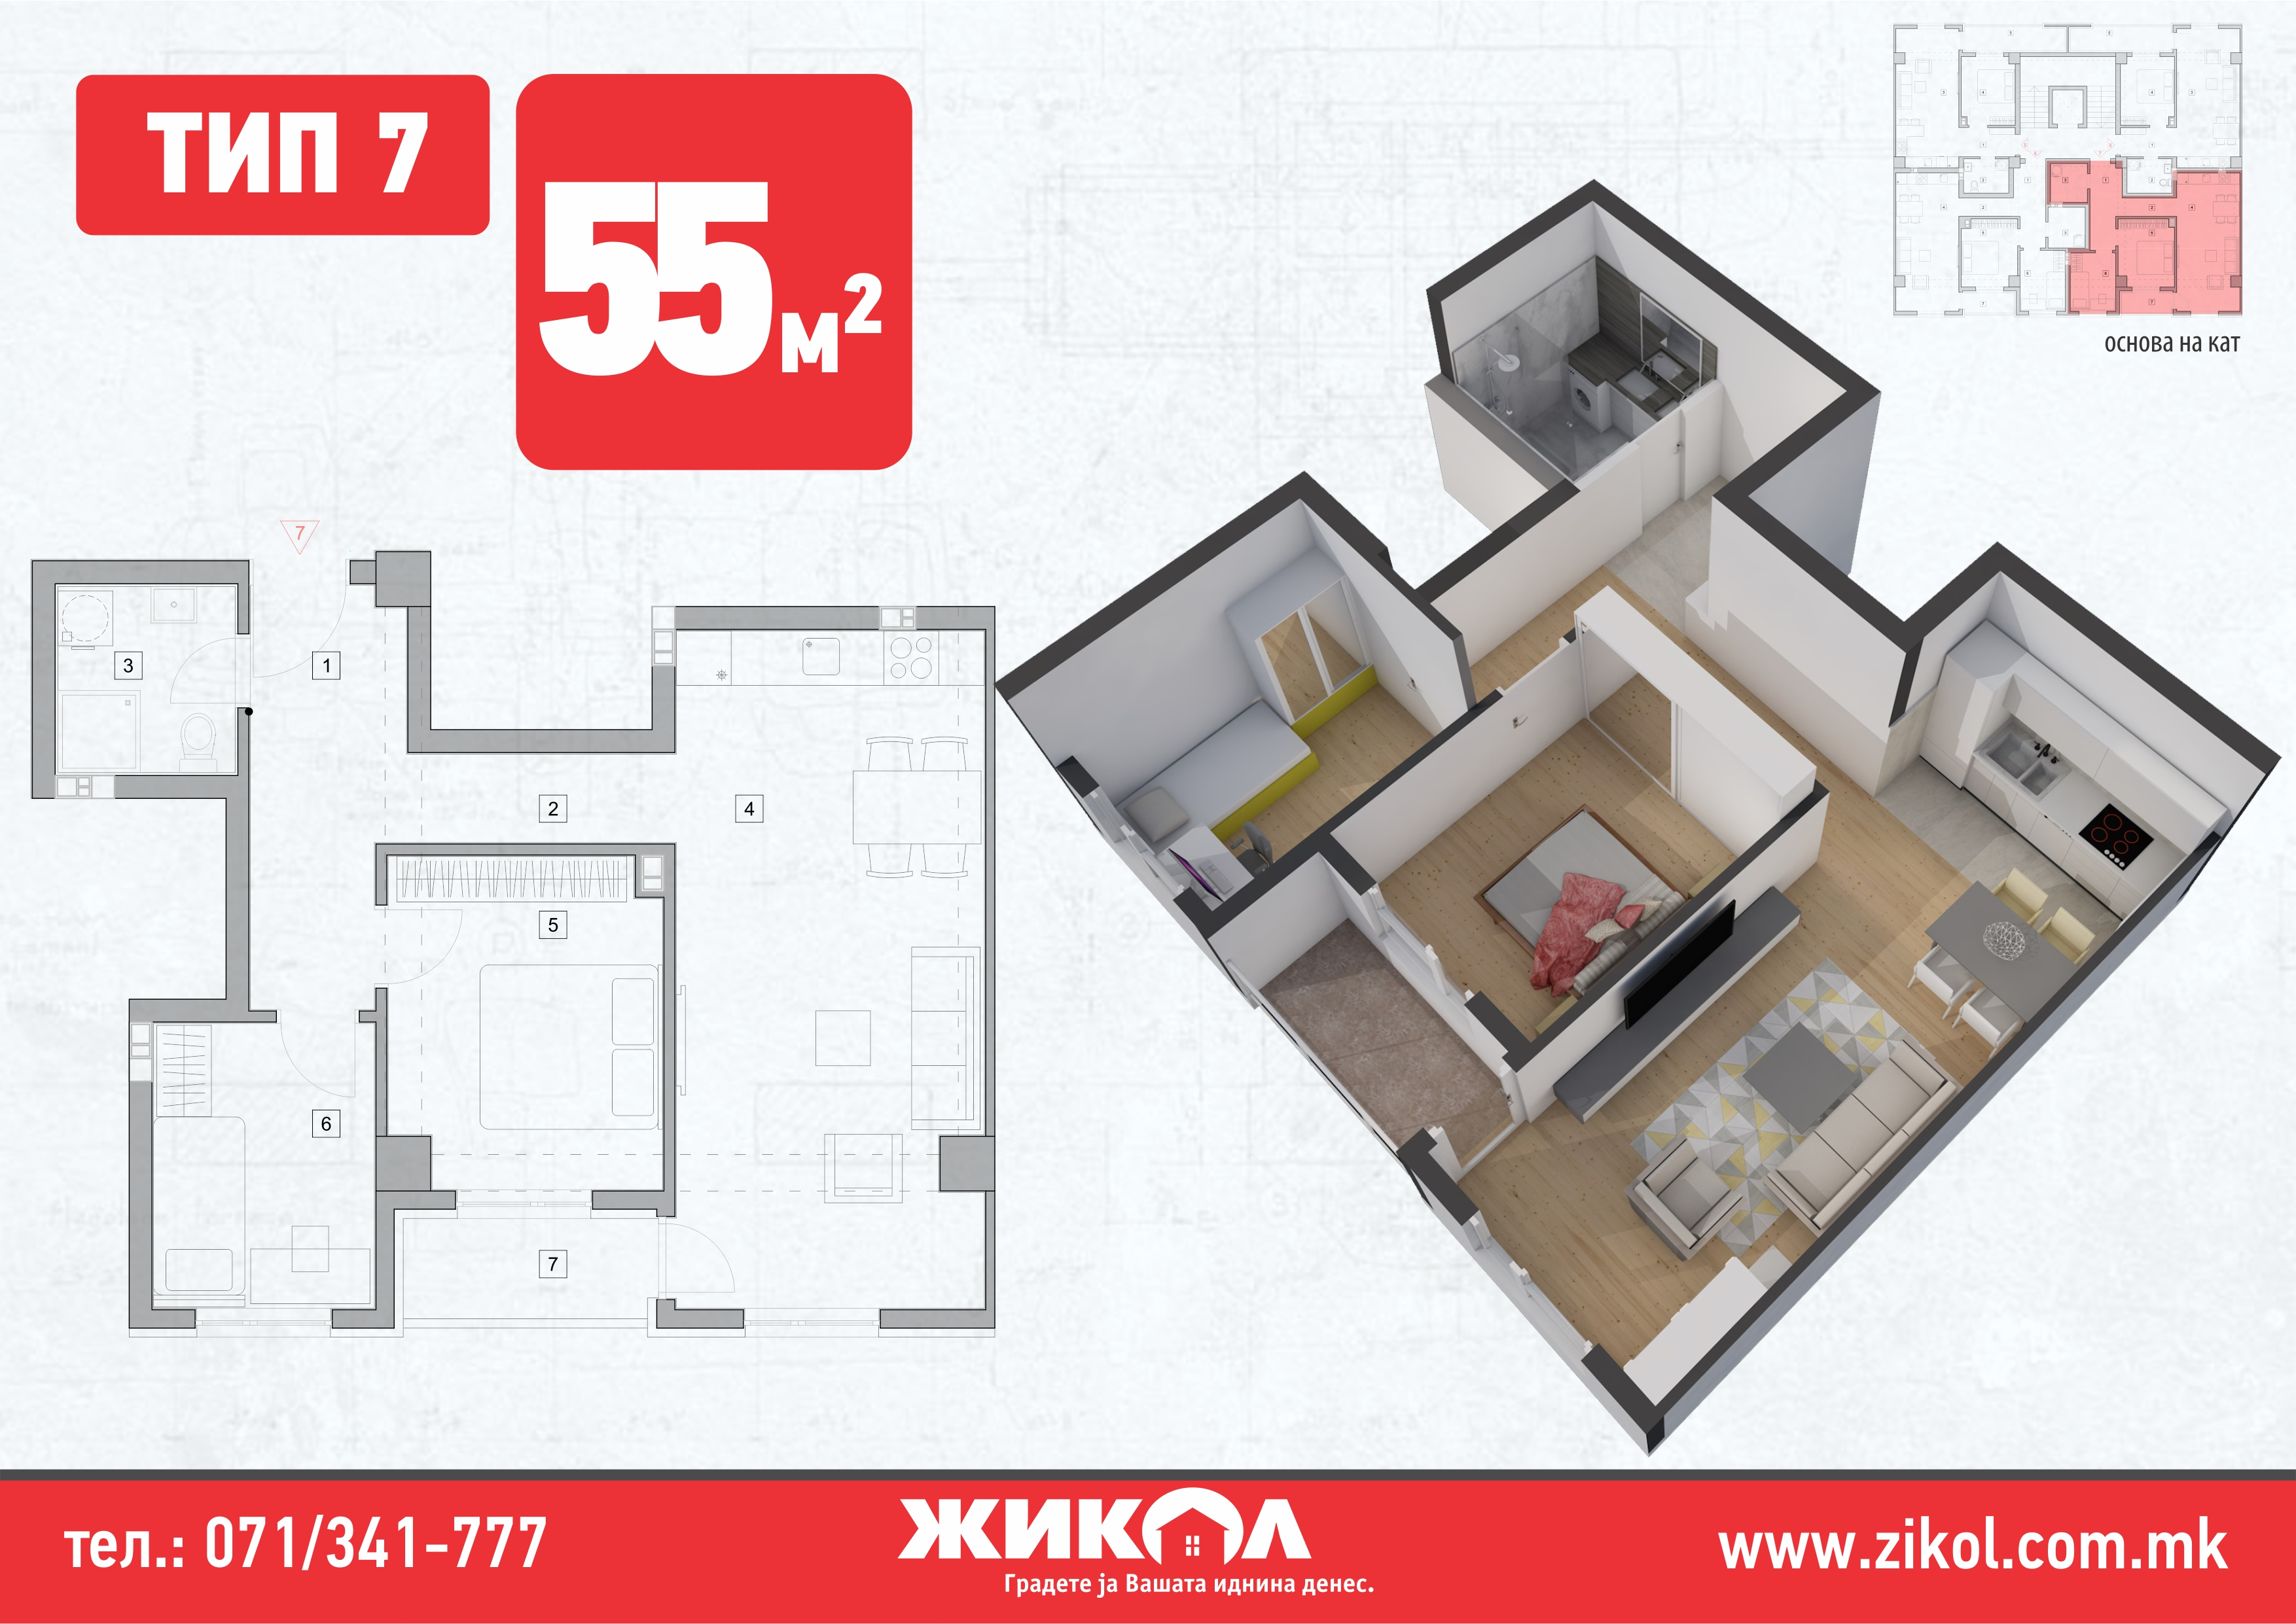 зграда 8, кат 1, стан 7